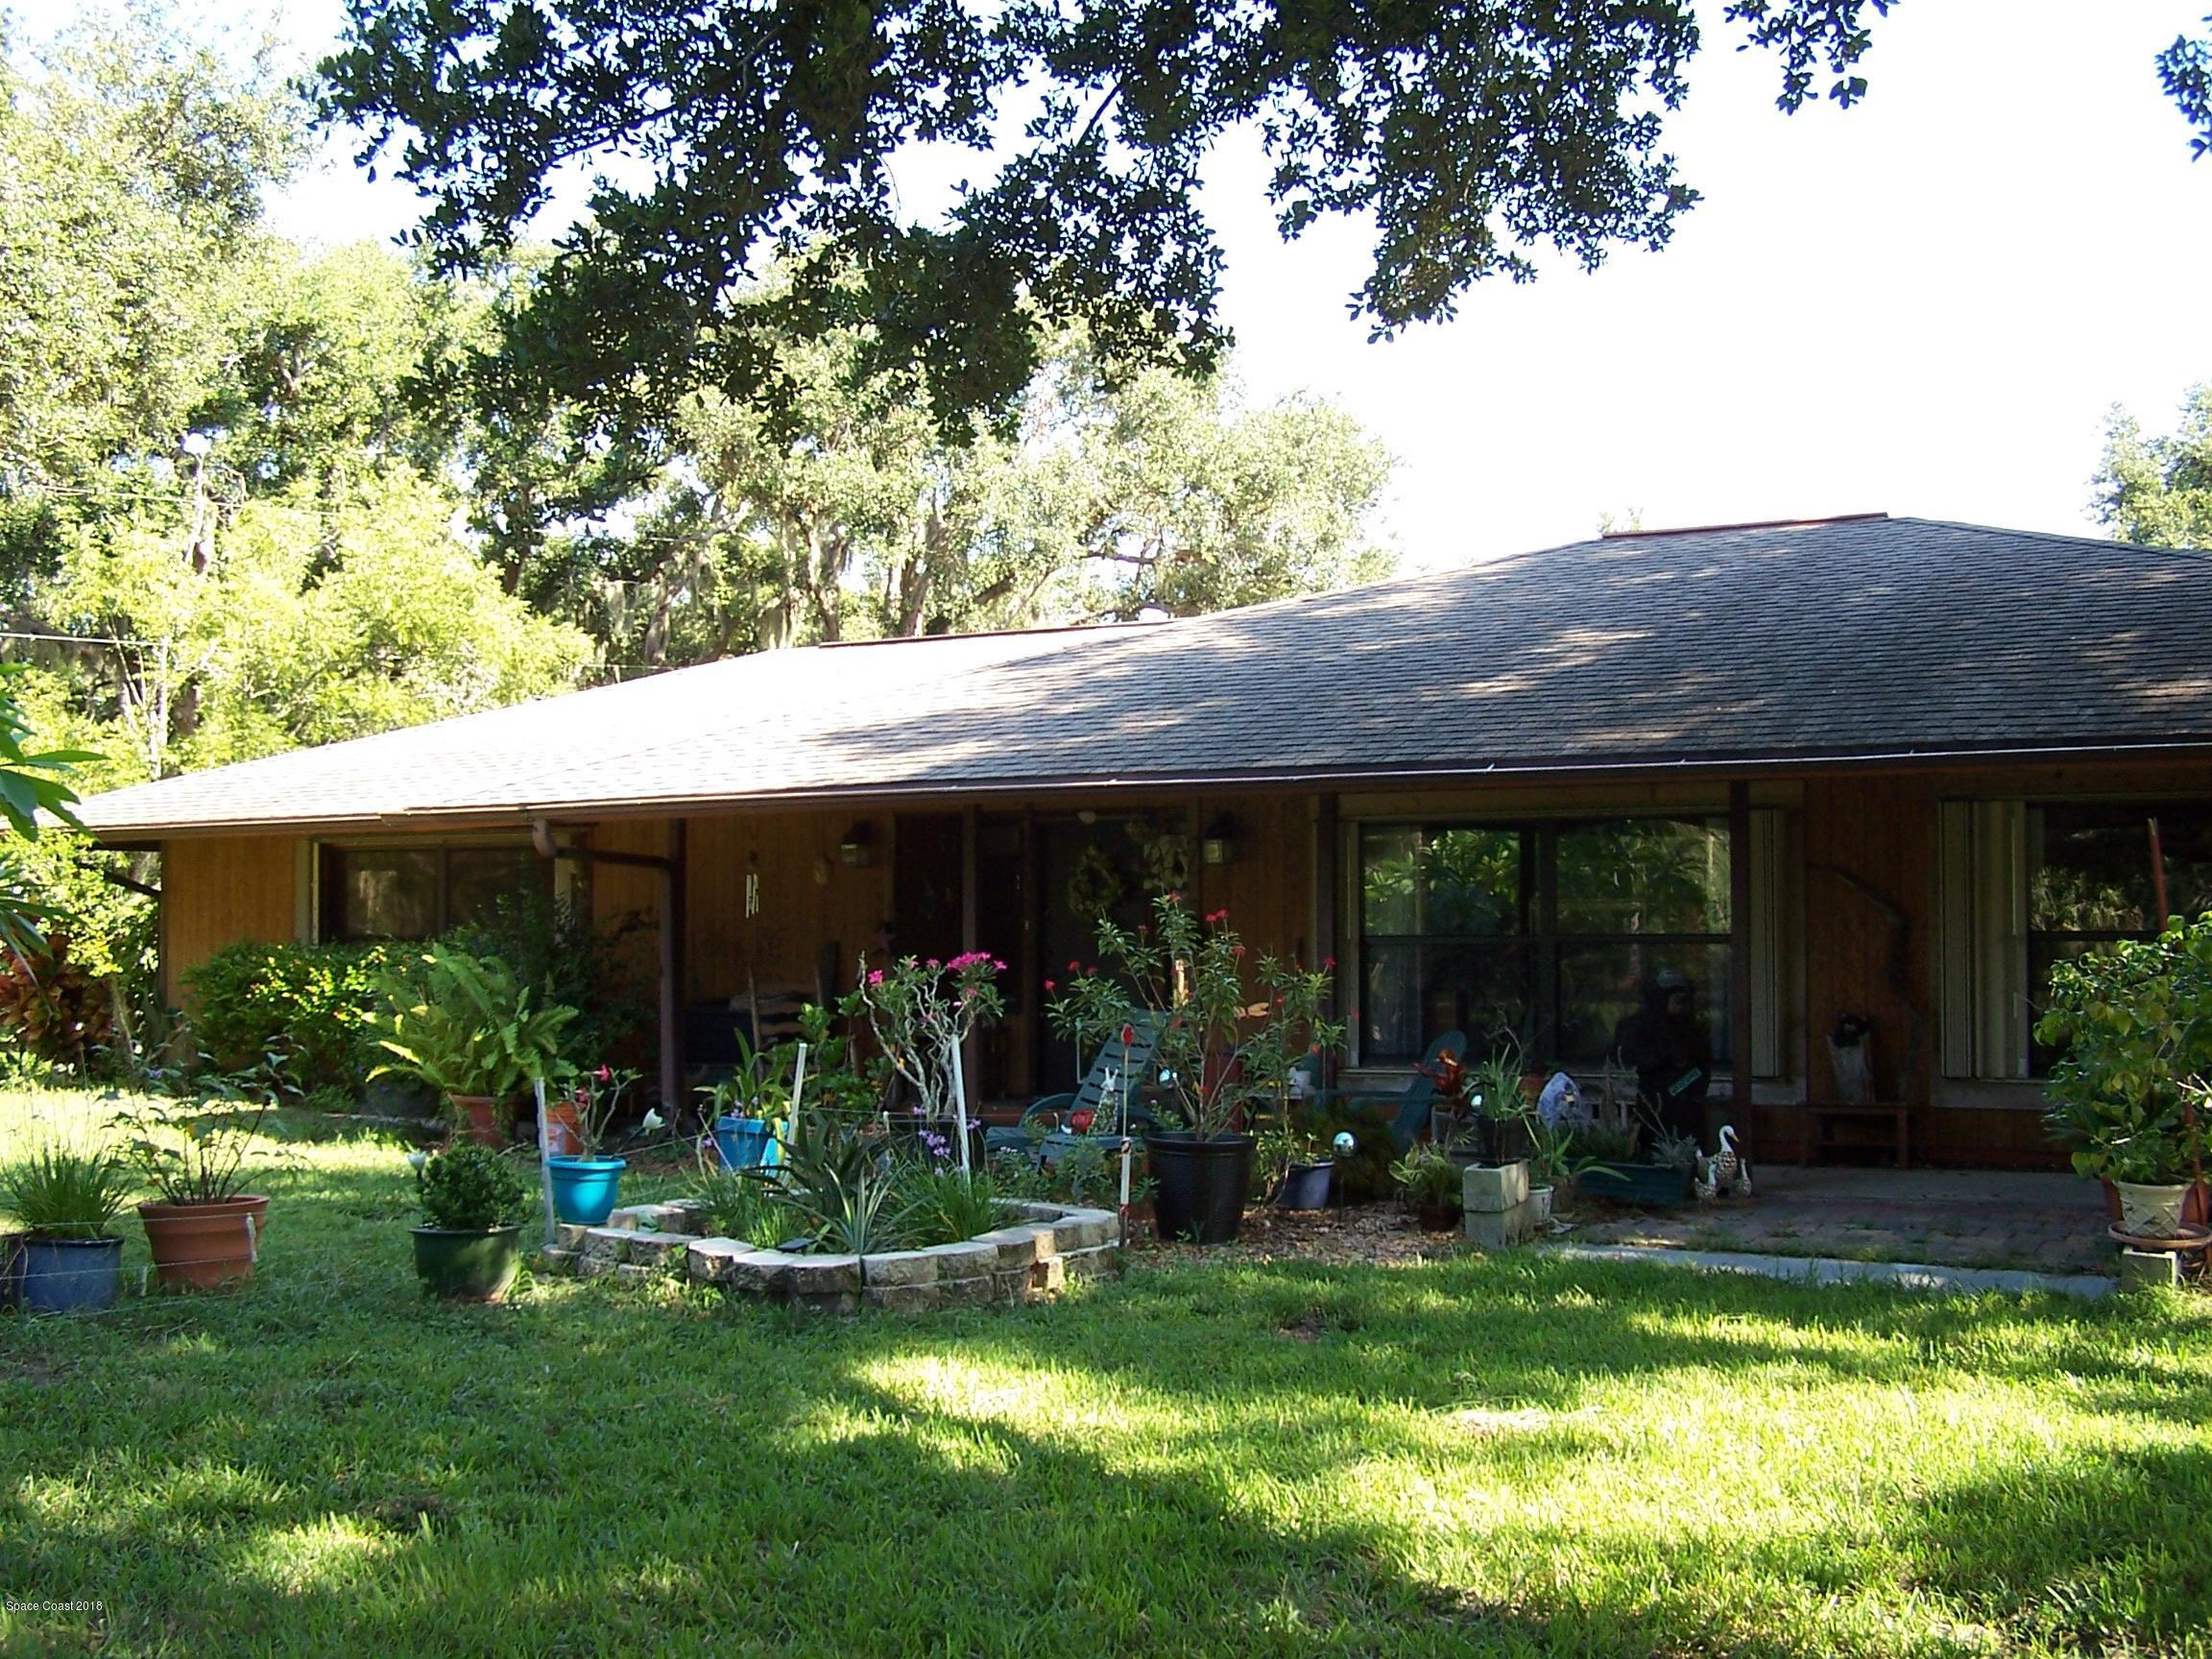 Single Family Home for Sale at 1240 Pine Island 1240 Pine Island Merritt Island, Florida 32953 United States